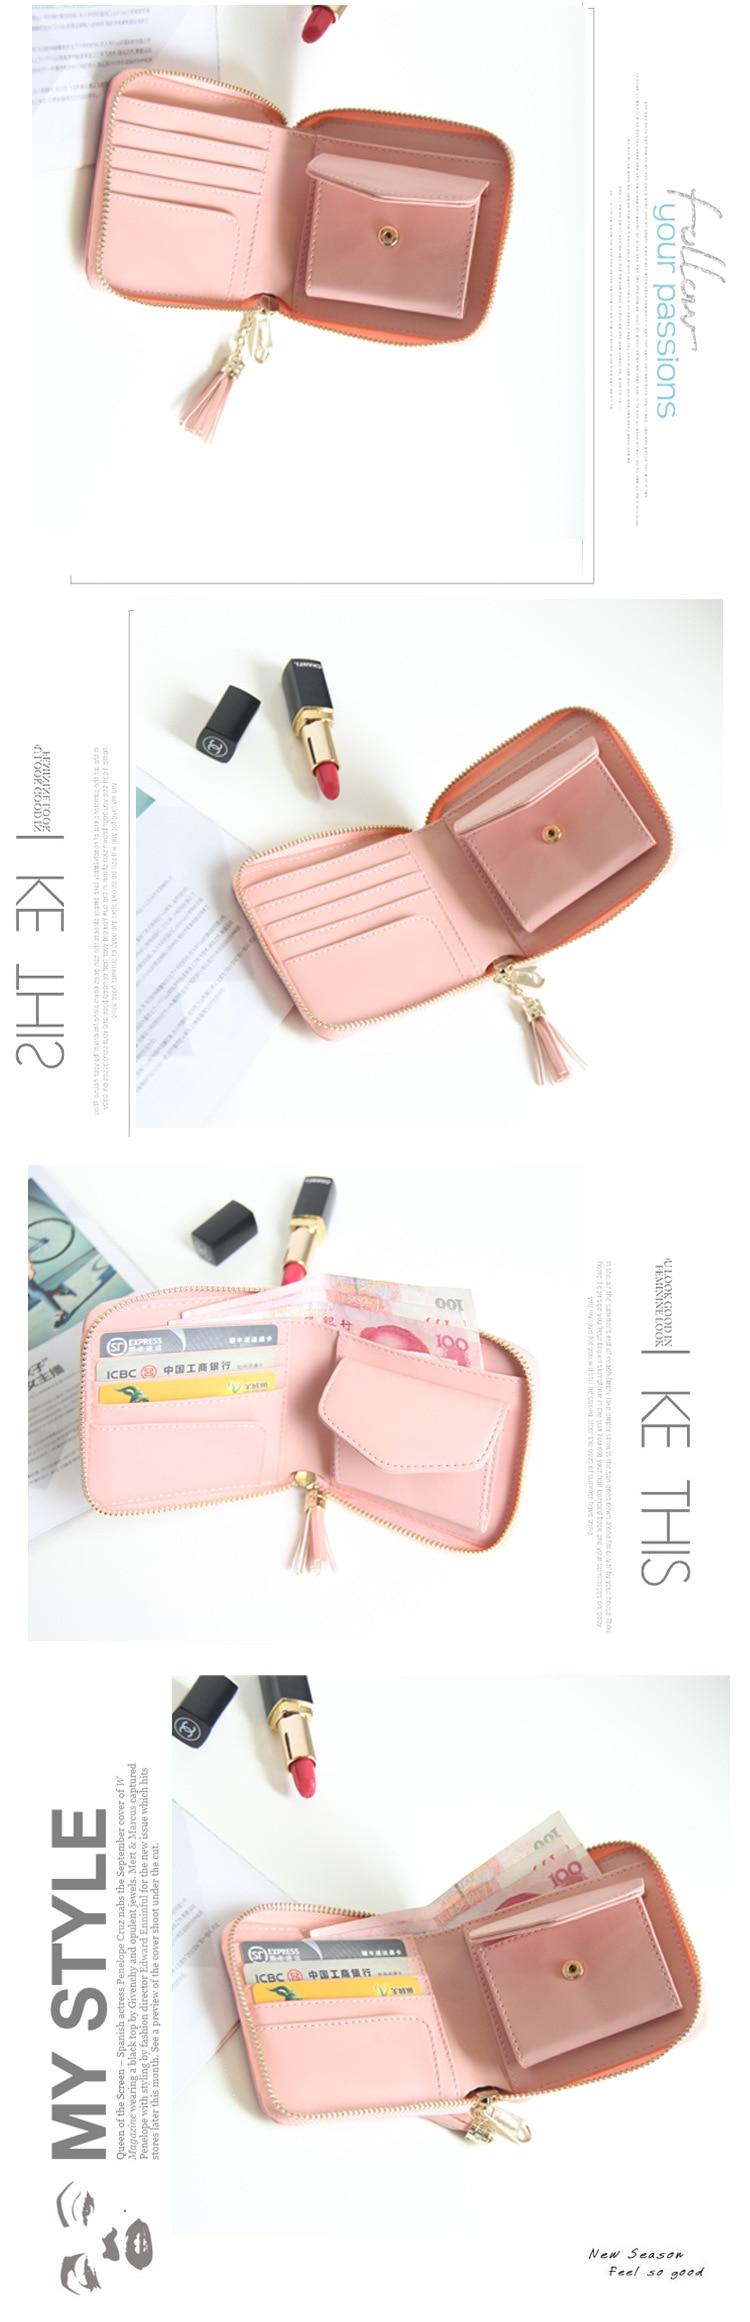 3407edc8fe806 Women Wallet Mack Up Purse Candy Color Wallet Card Holder Purse Tassel  Female Clutch Chain Mini Purses ID Billetera Hombre